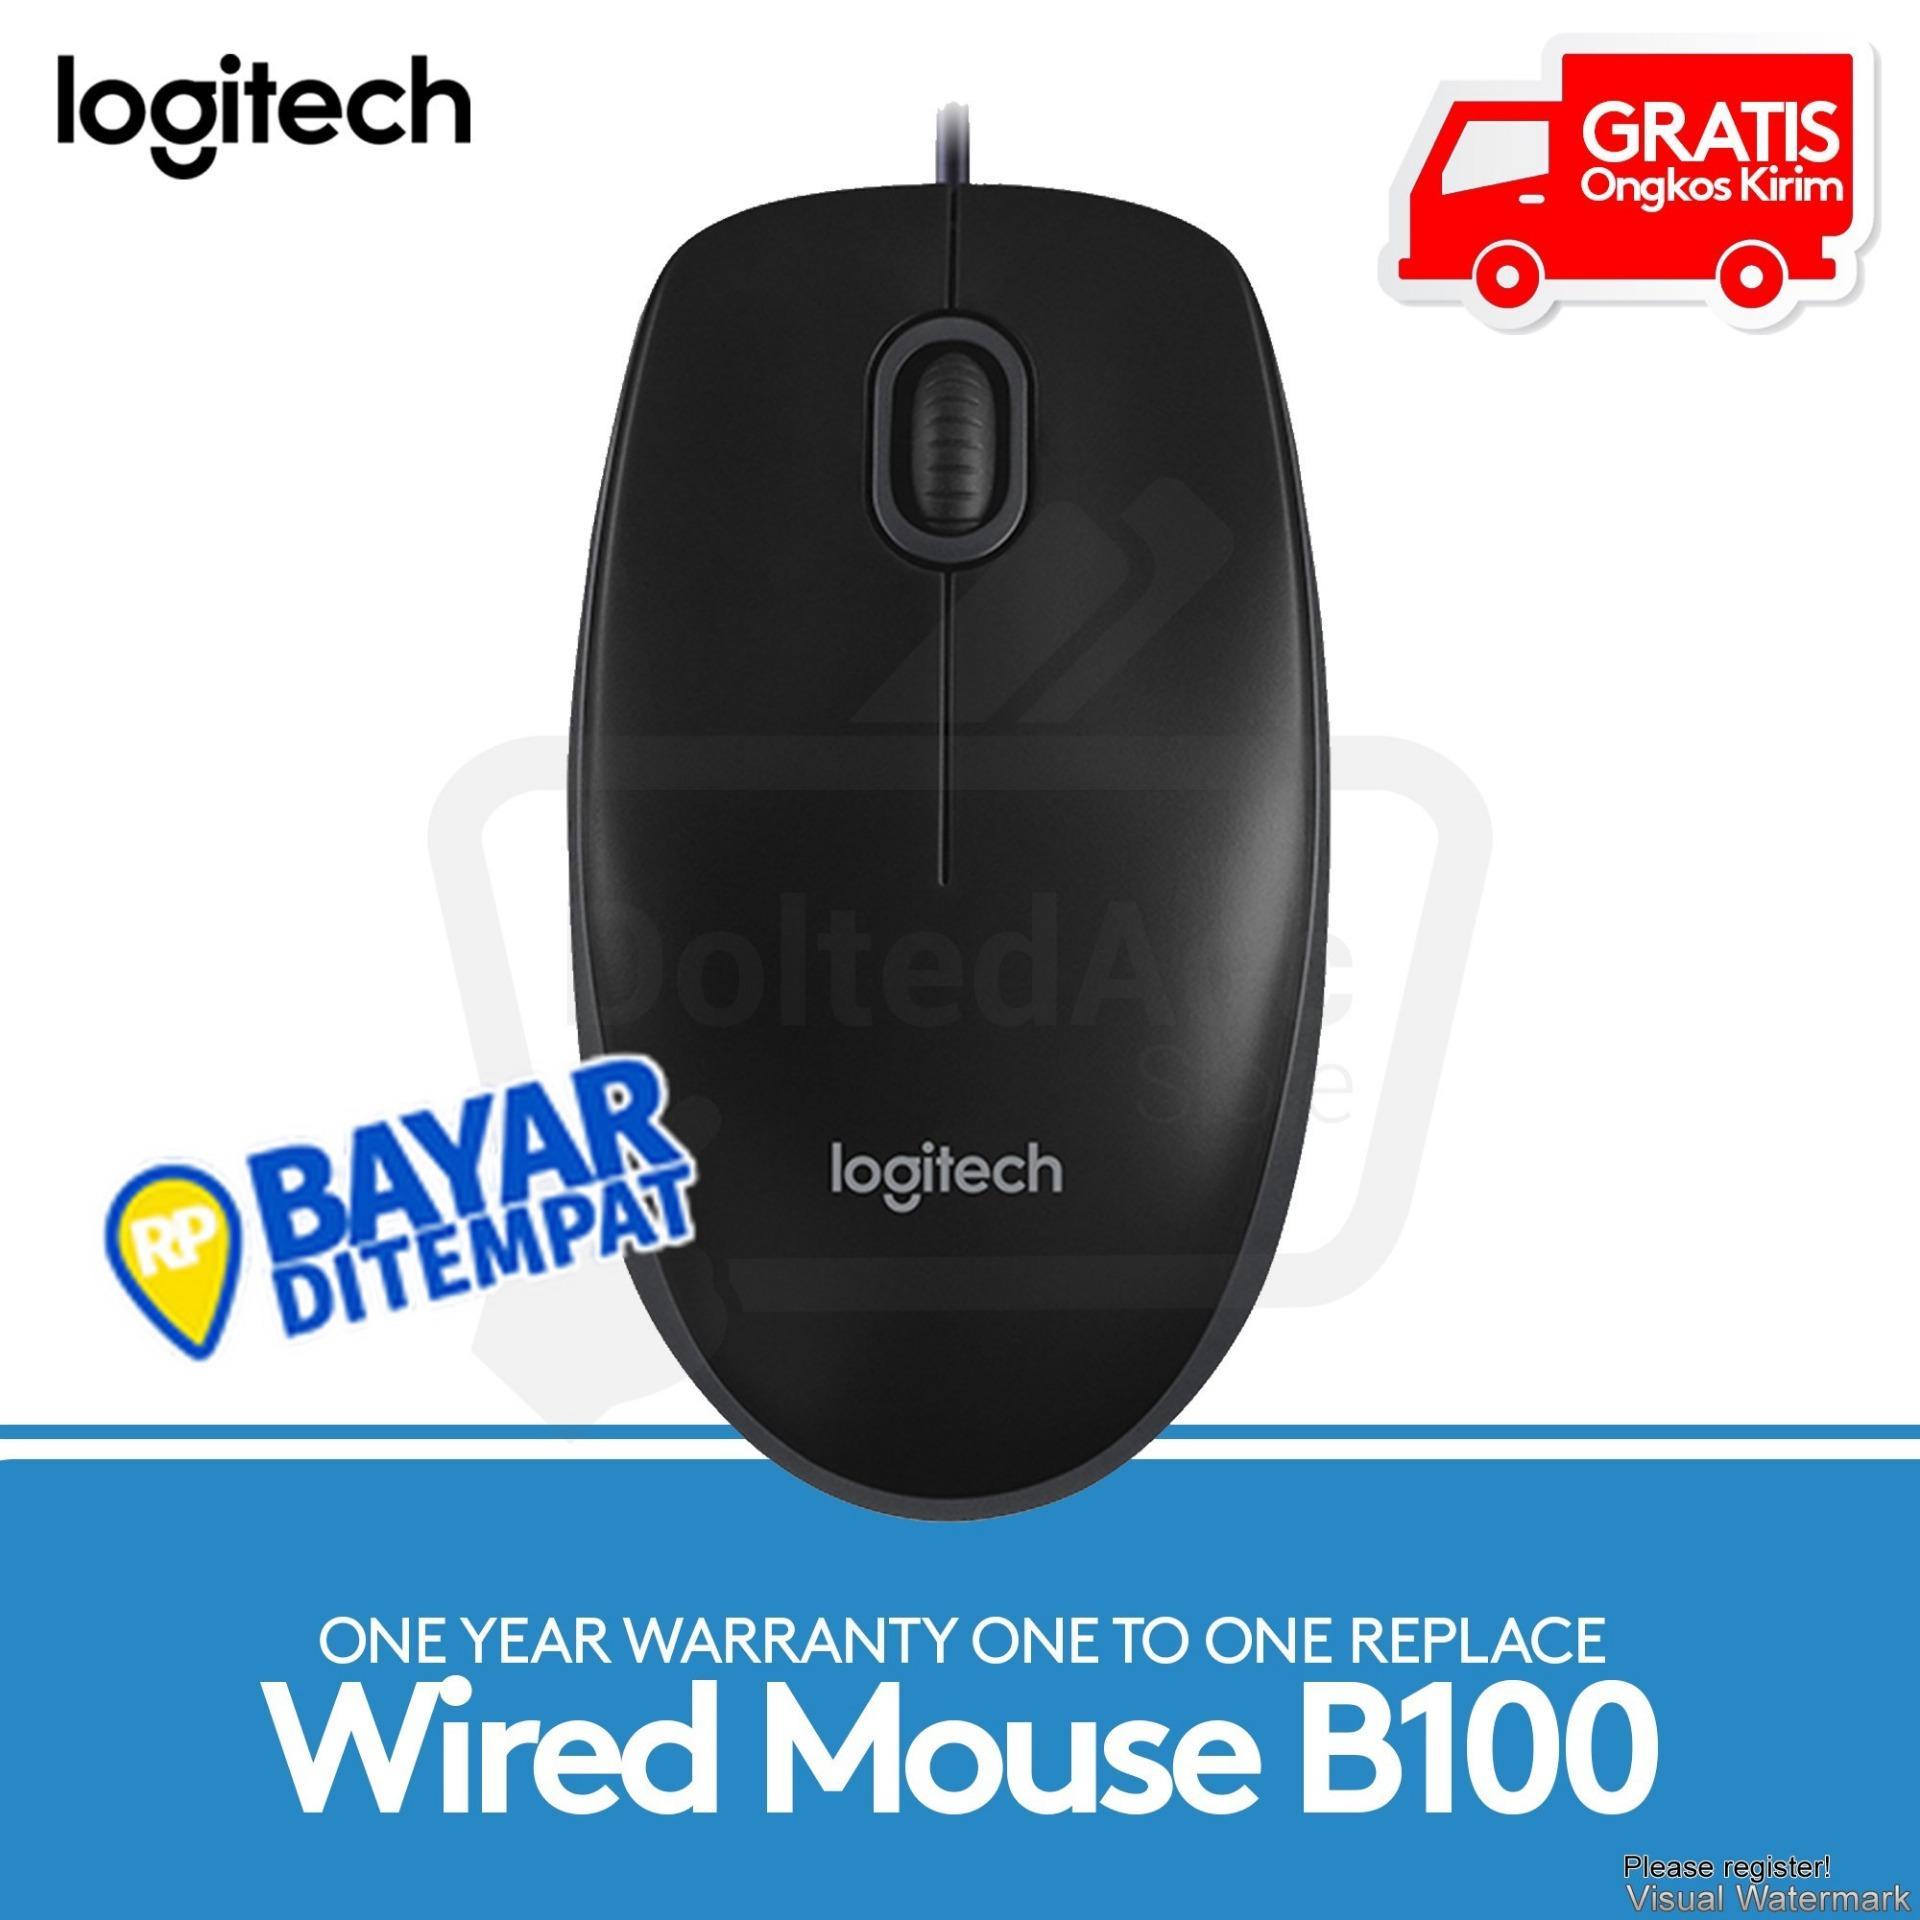 Jual Aksesoris Komputer Terlengkap Murah Keyboard Votre Kb2308 Usb Logitech Mouse Optical B100